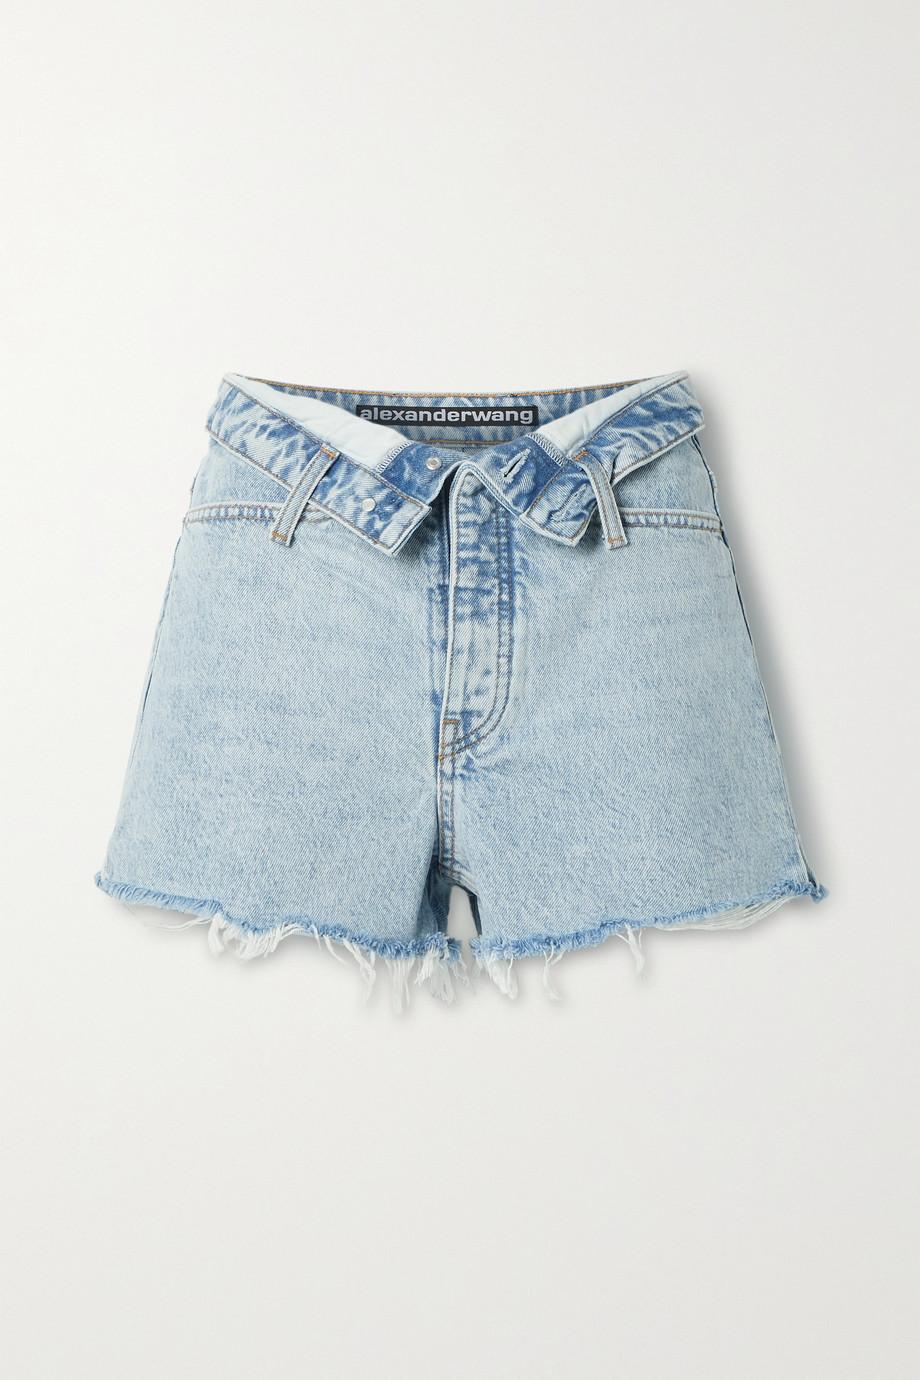 Alexander Wang Bite distressed denim shorts